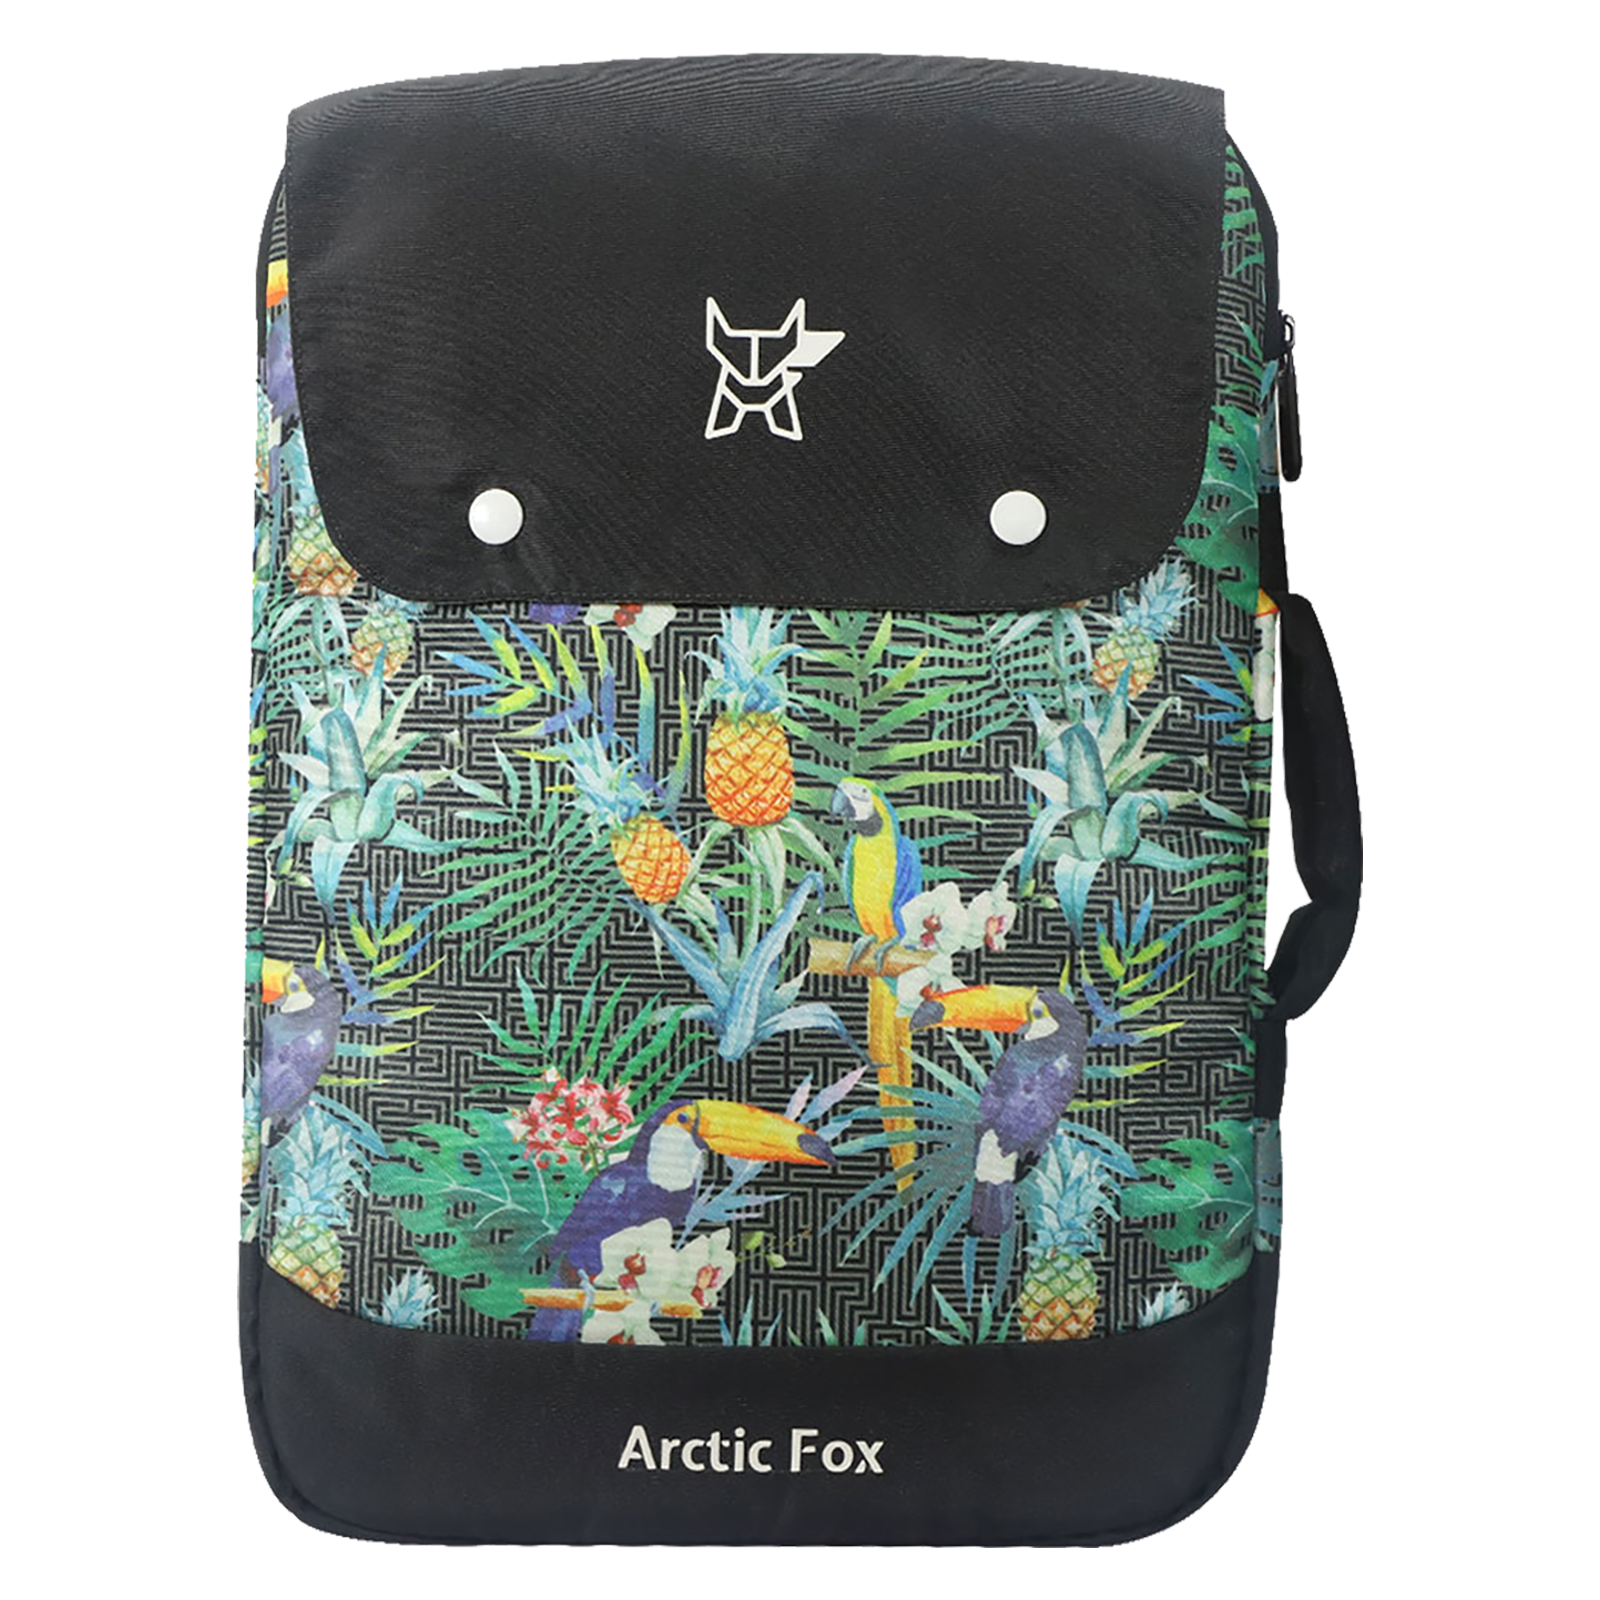 Arctic Fox Bonded Polyester Fabric Sleeve for Laptop (FACLSLSUMOE137000, Green)_1